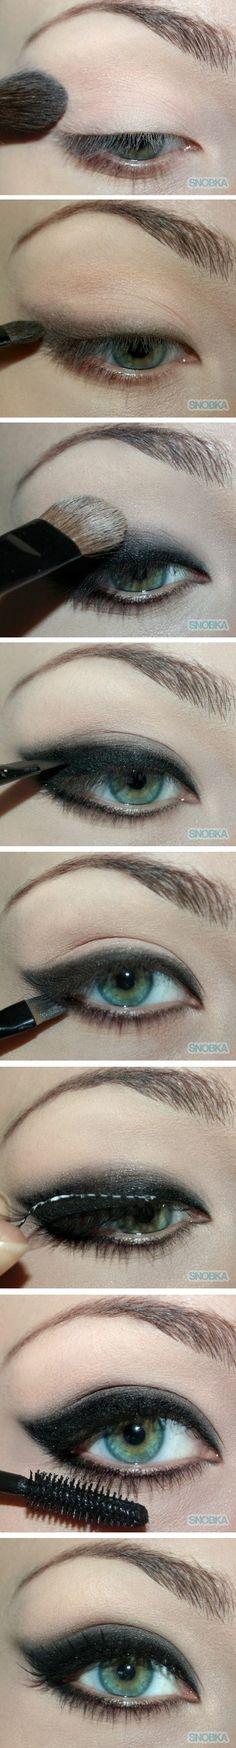 Brigitte Bardot style makeup